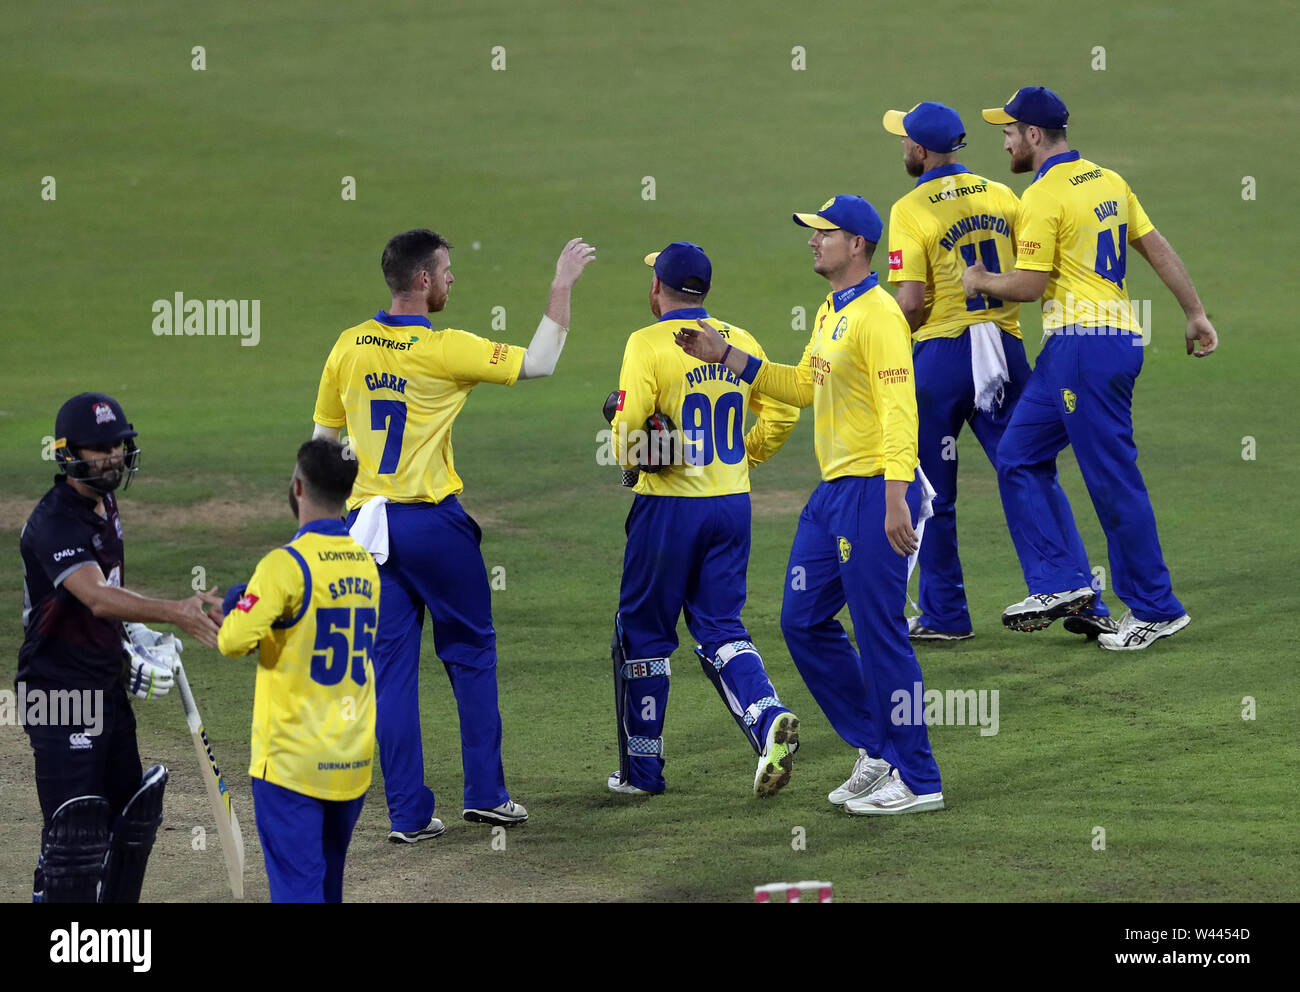 Durham players celebrate winning the match during the Vitality Blast T20 match at Emirates Riverside, Durham. - Stock Image